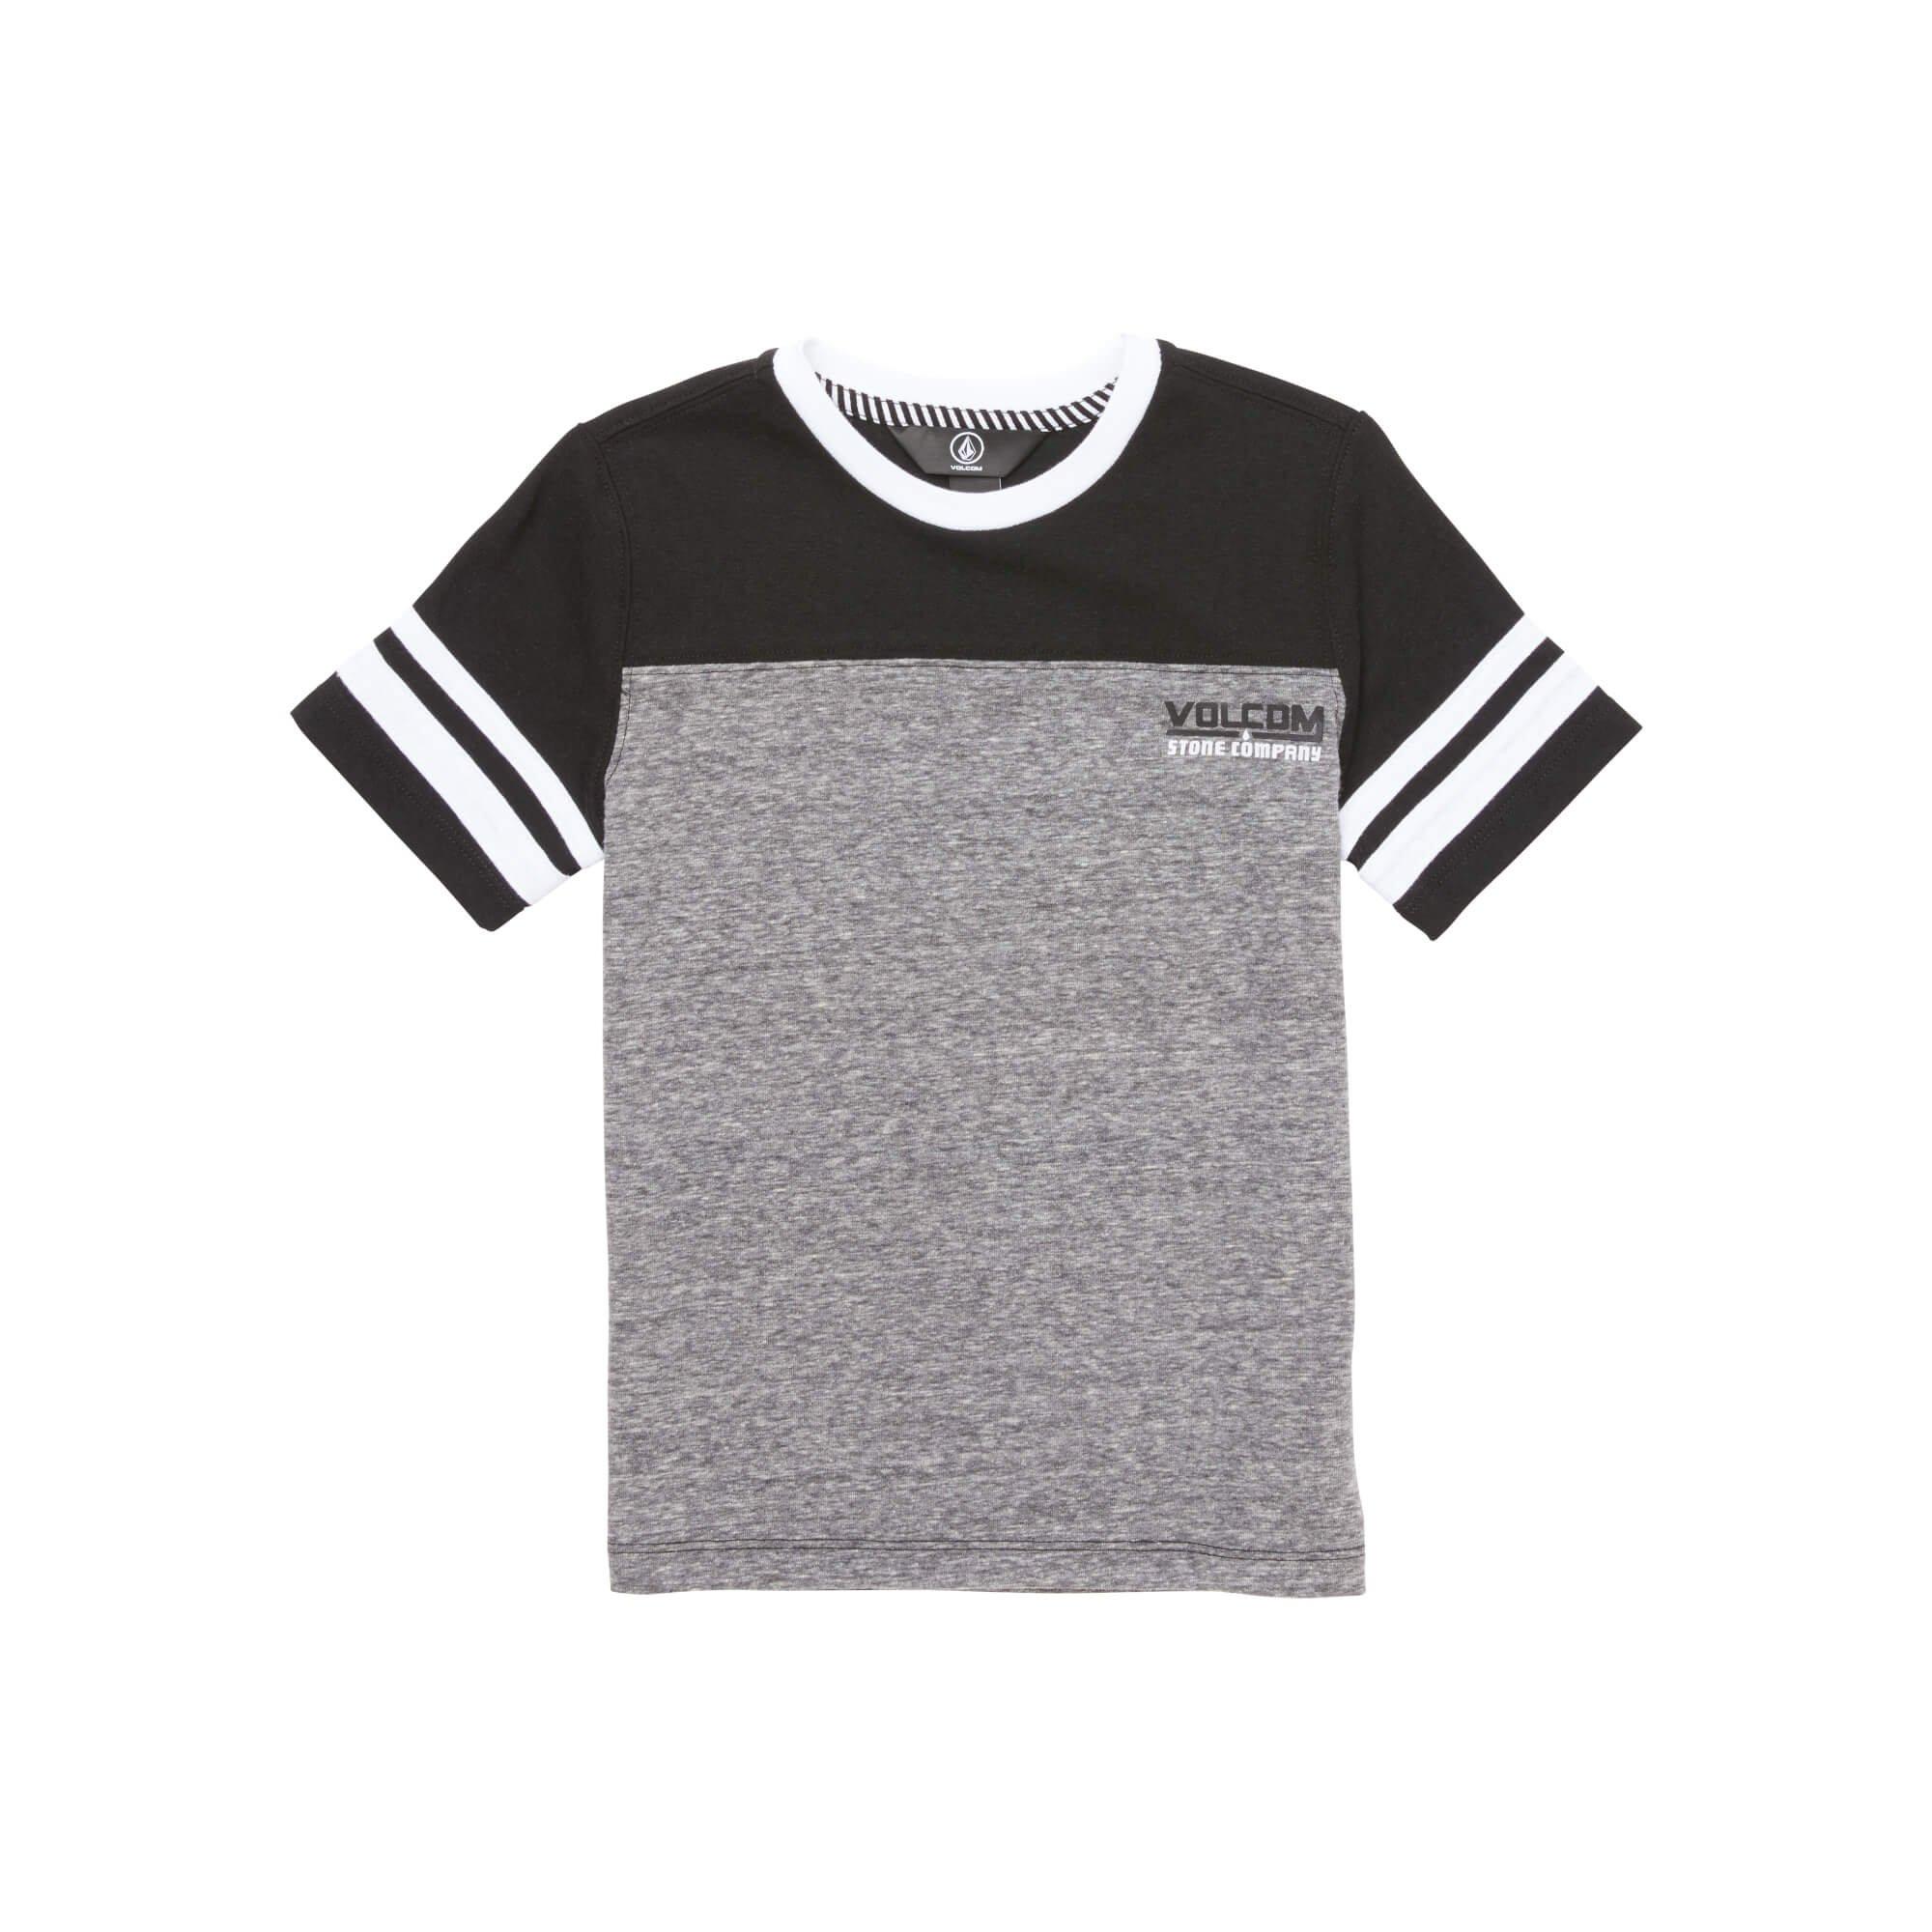 Volcom Little Boys' Walden Knit Short Sleeve Crew, Black, 4T